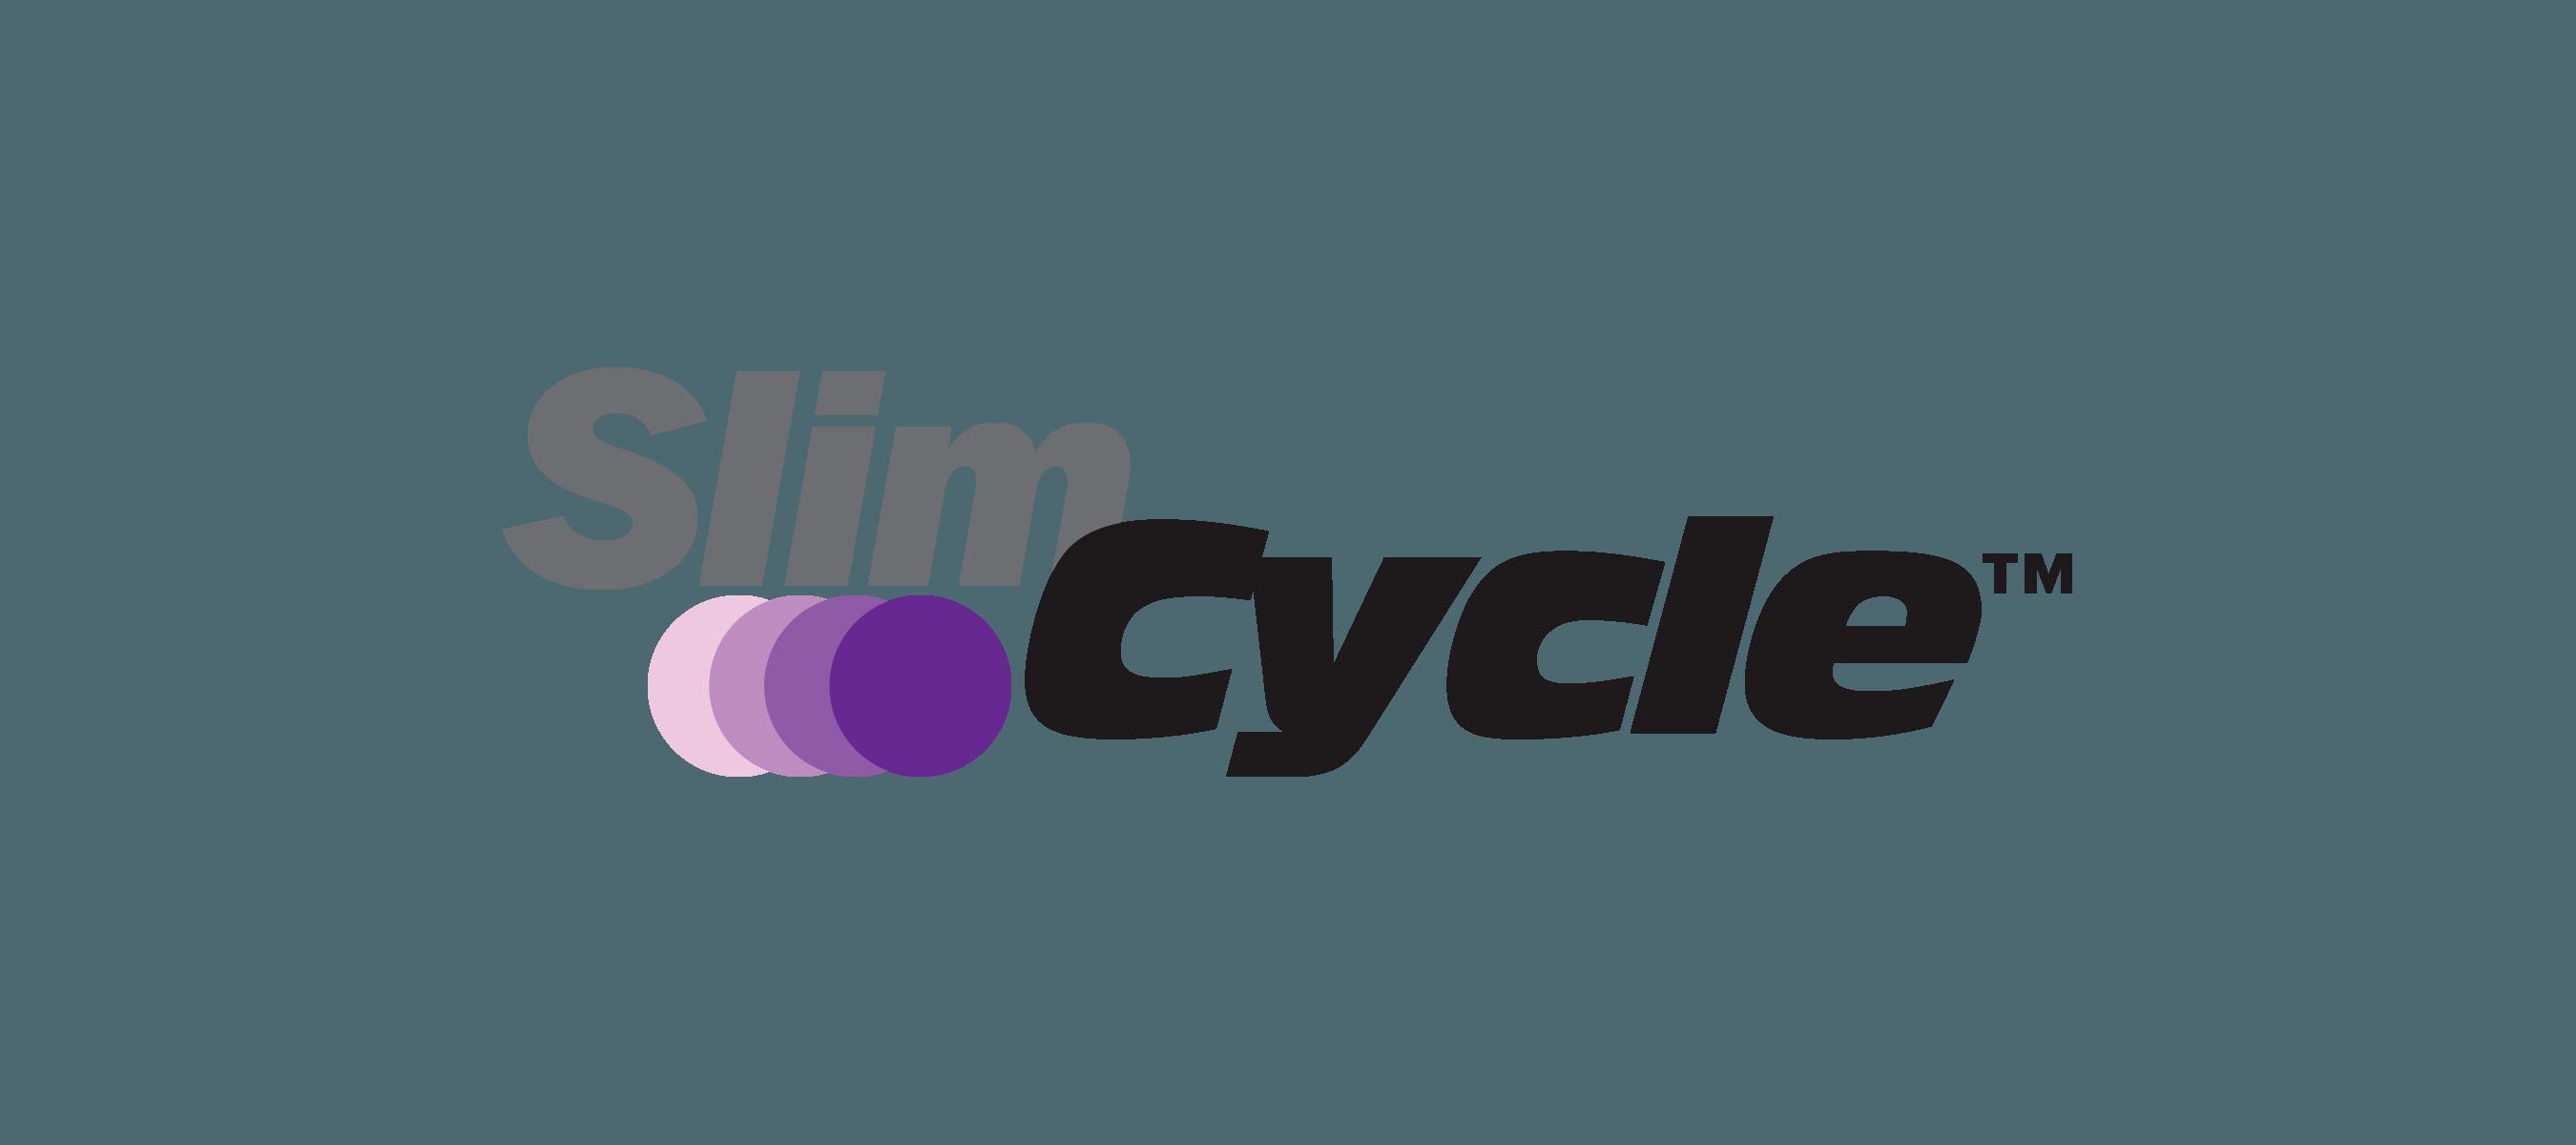 Slim Cycle Official Site As Seen On Tv Vimeo Logo Tech Company Logos Company Logo